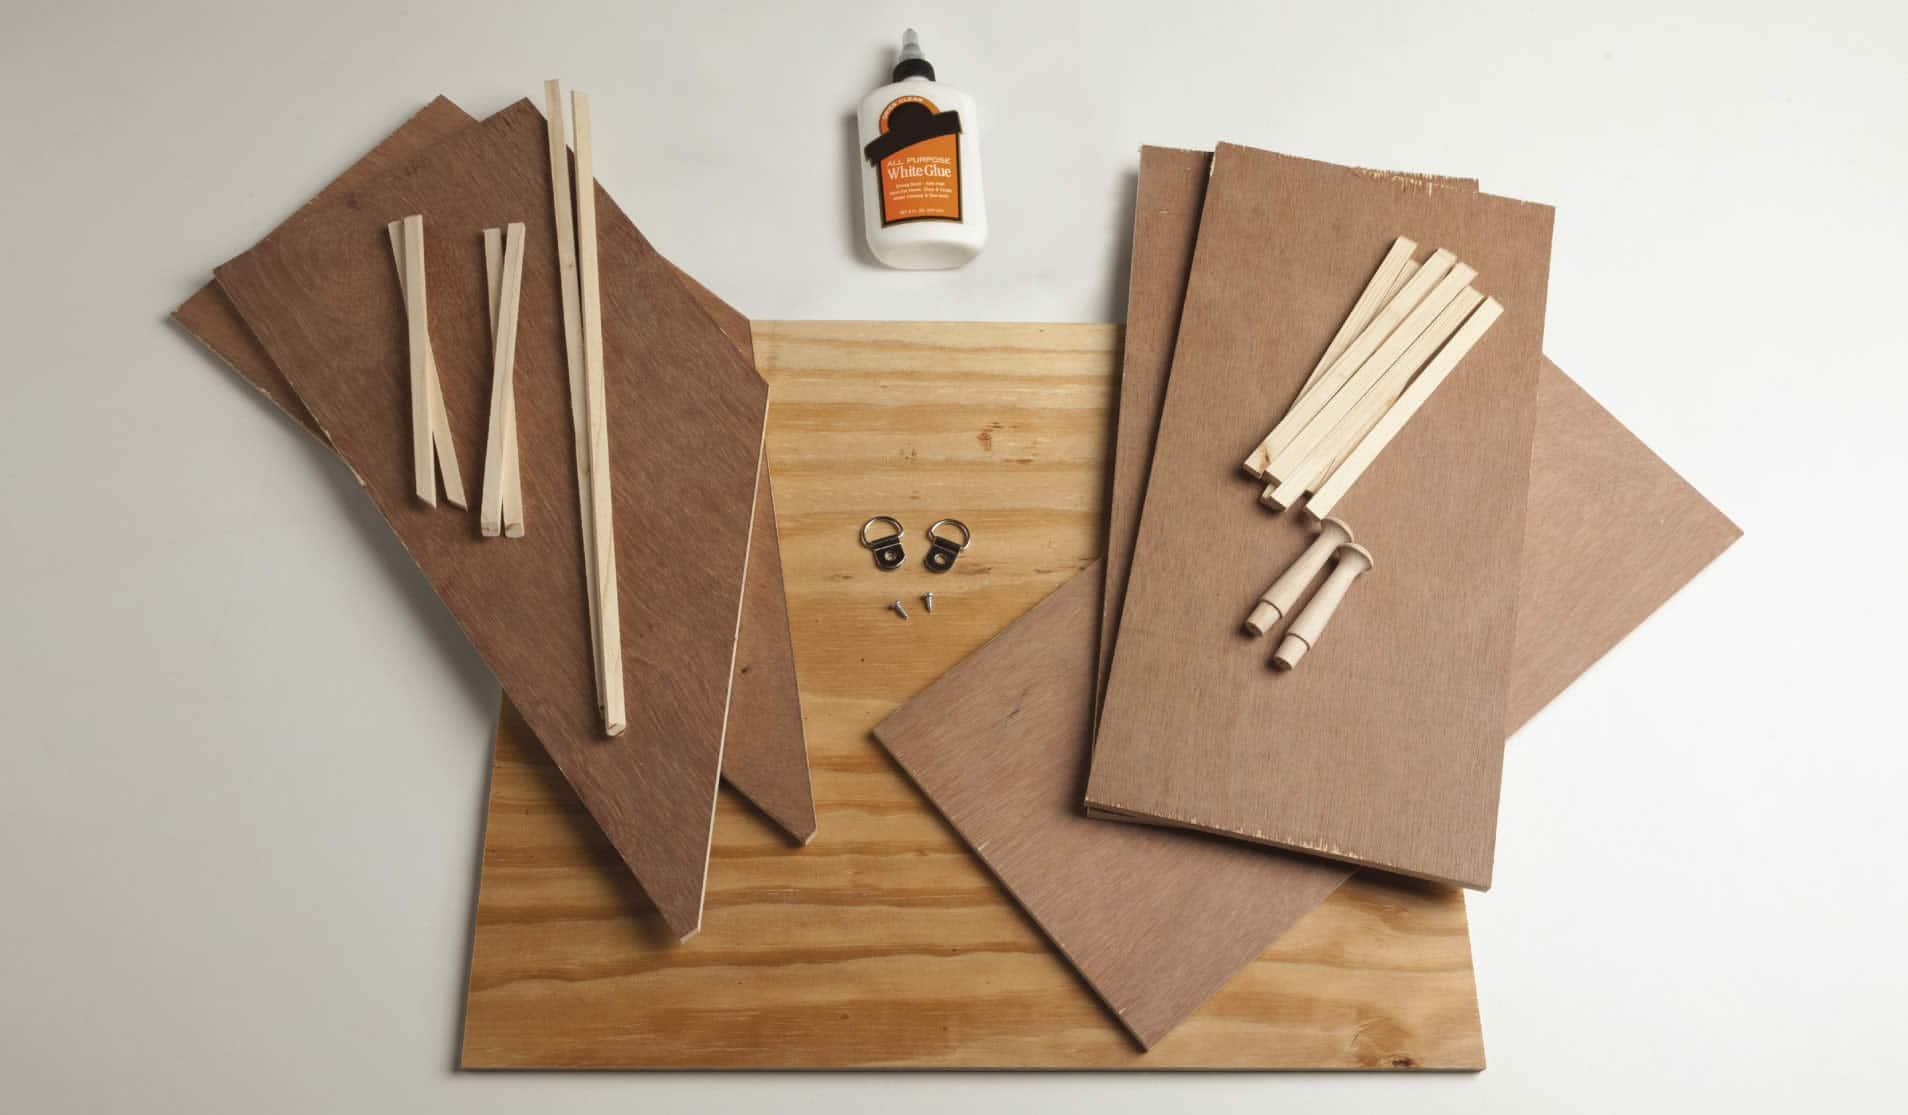 tool-organizer-arrow-project-supplies.jpg